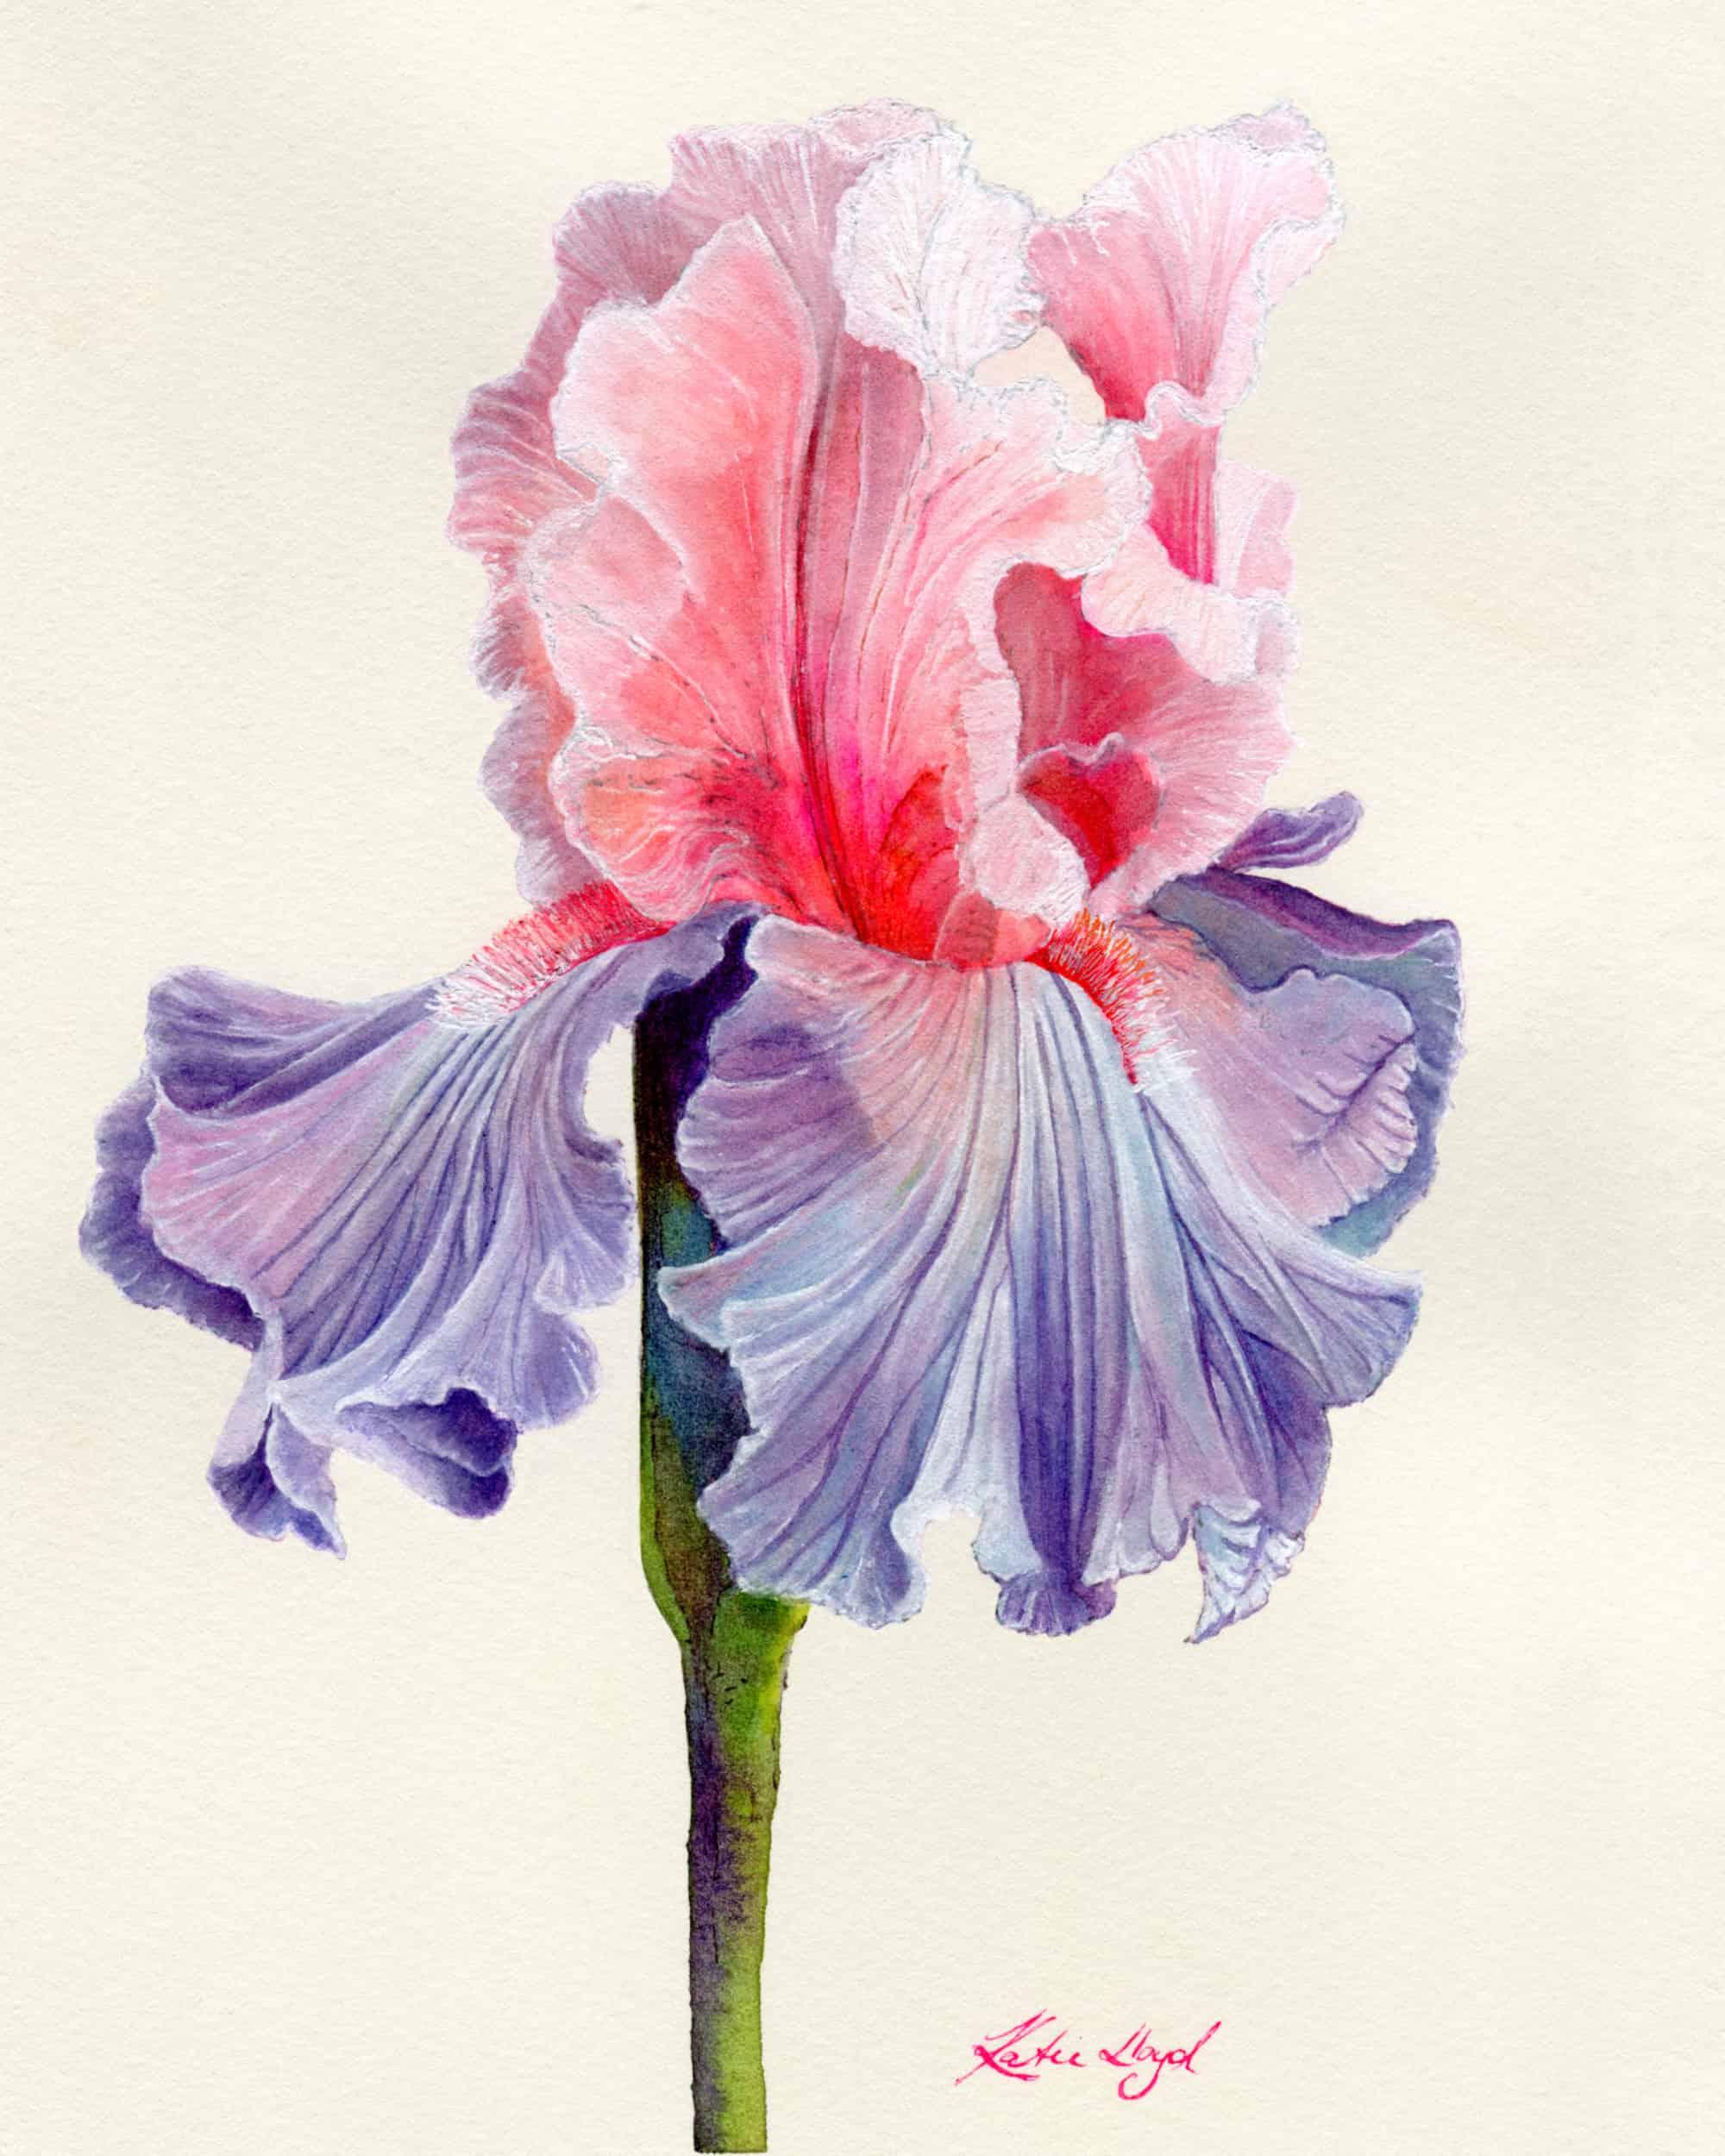 Wildwood Bloom Visual Portfolio